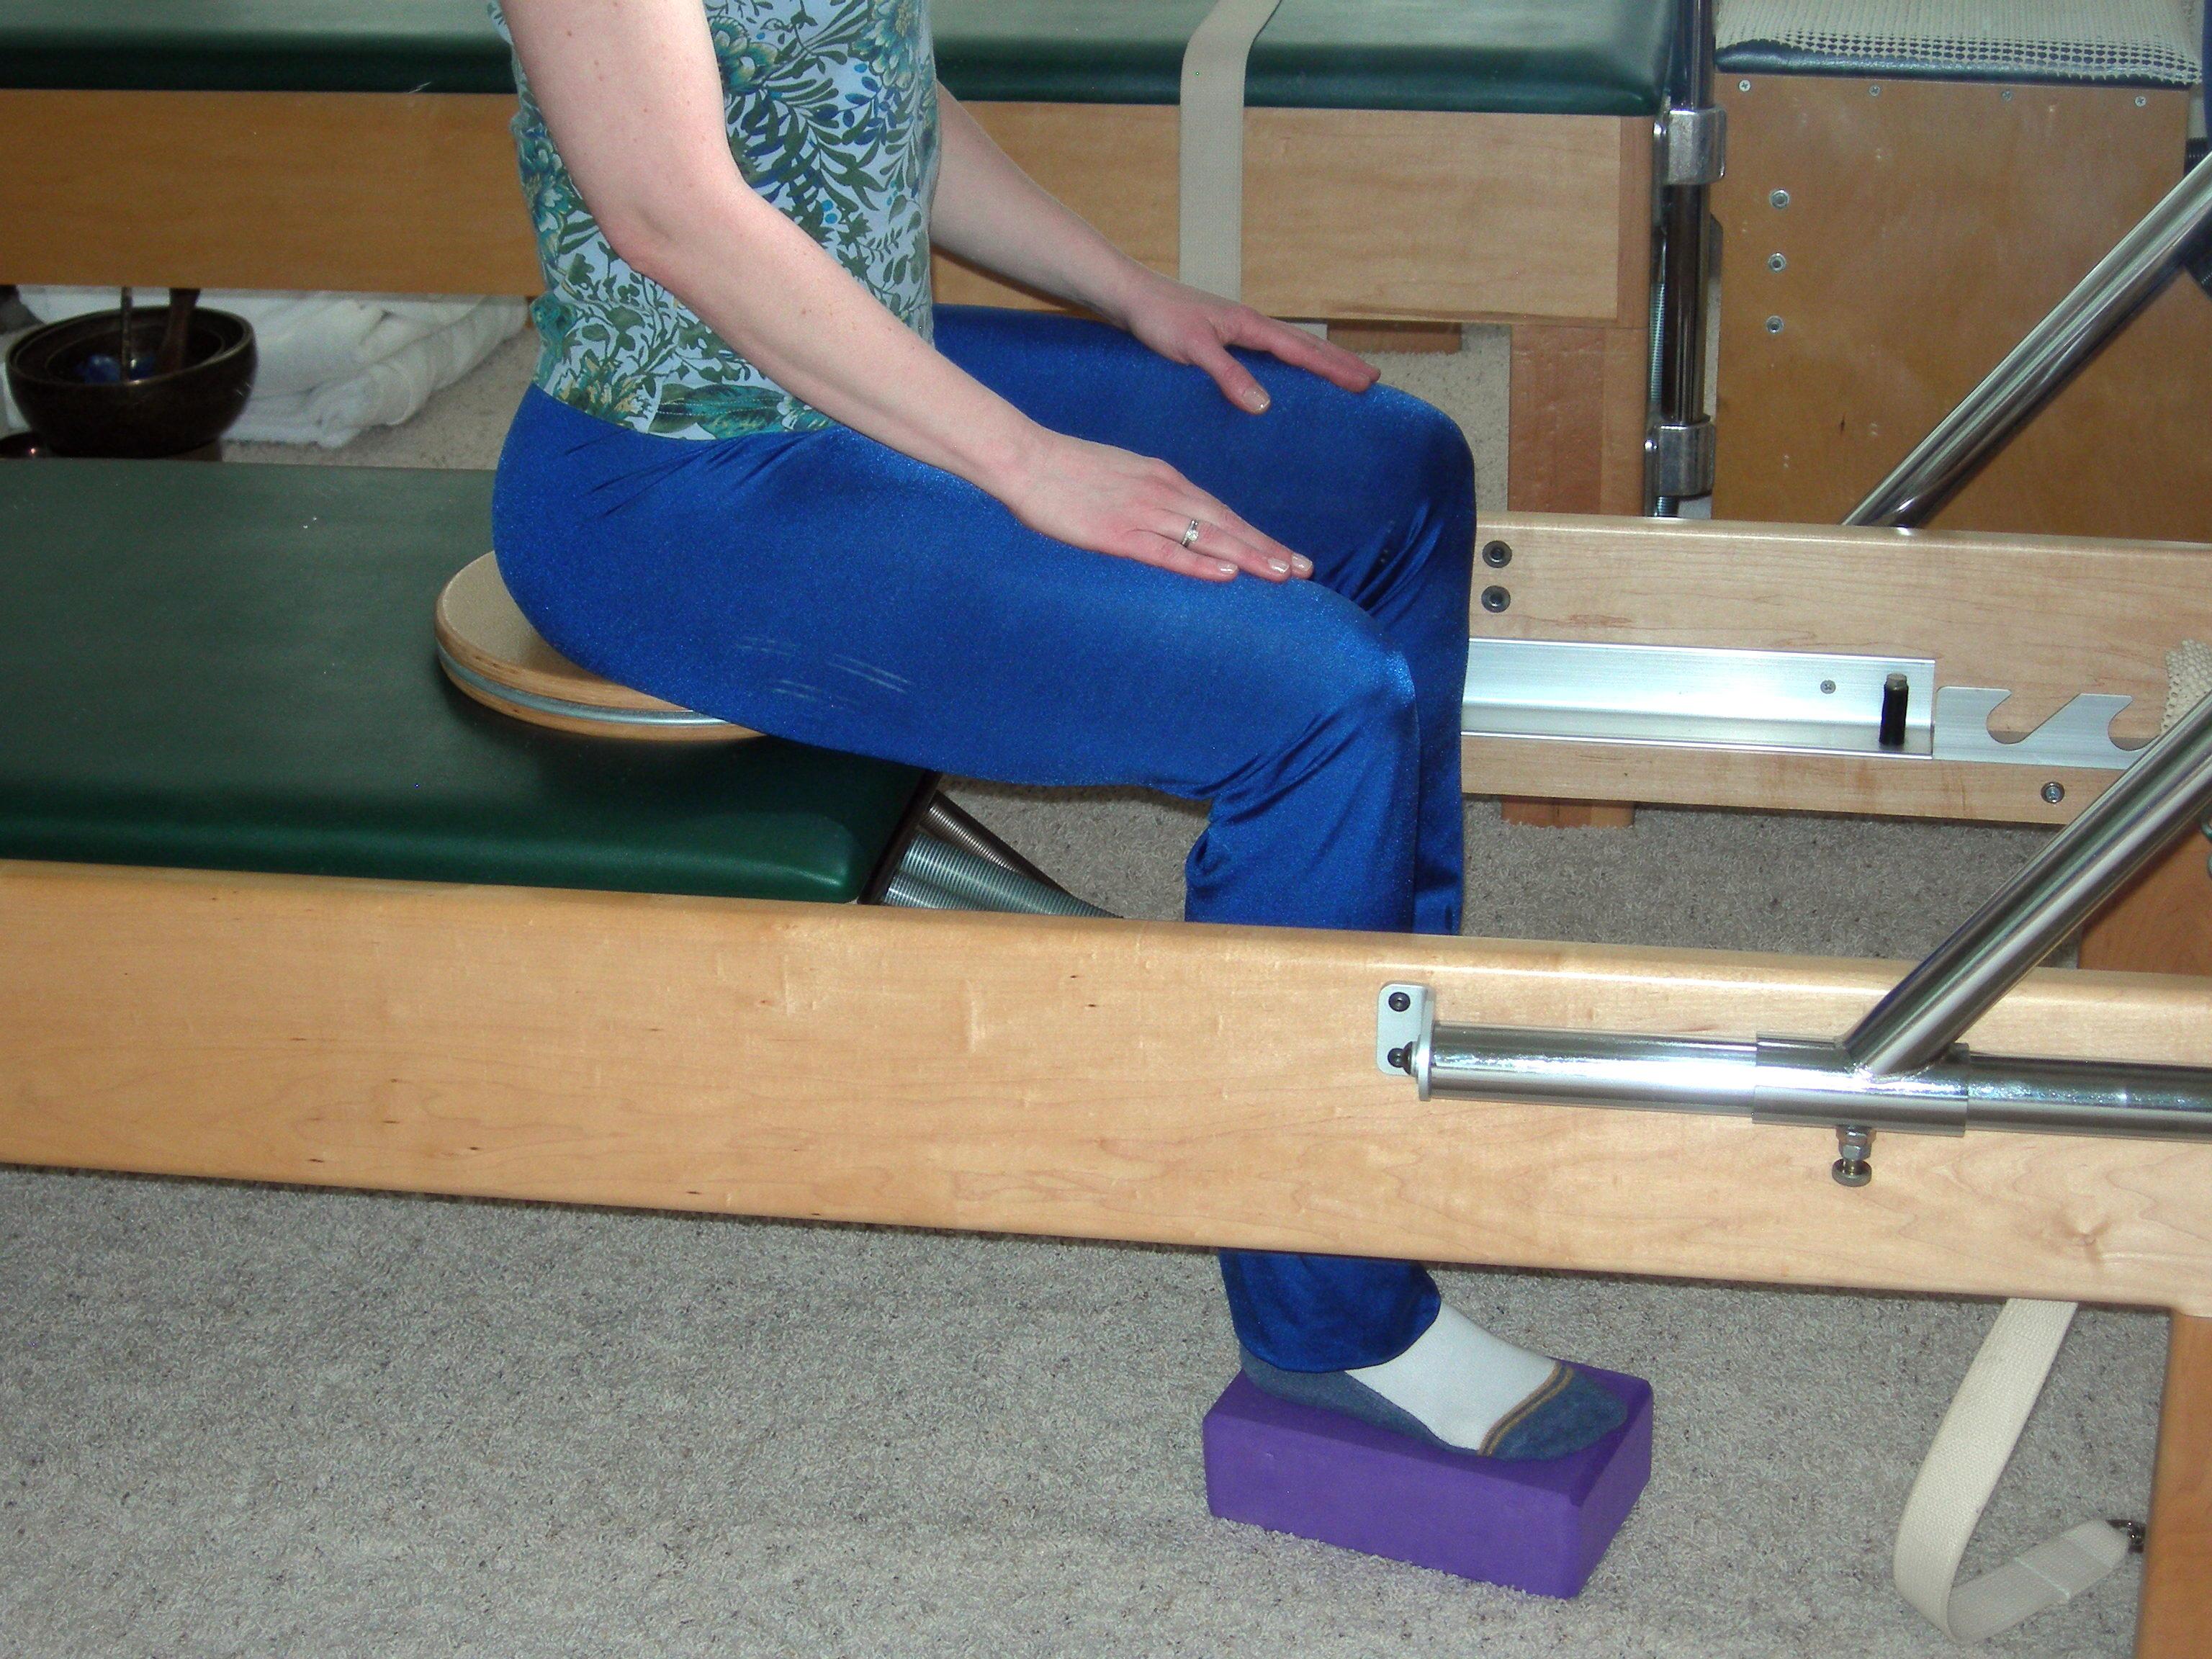 Sciatica Pilates Teacher Tips